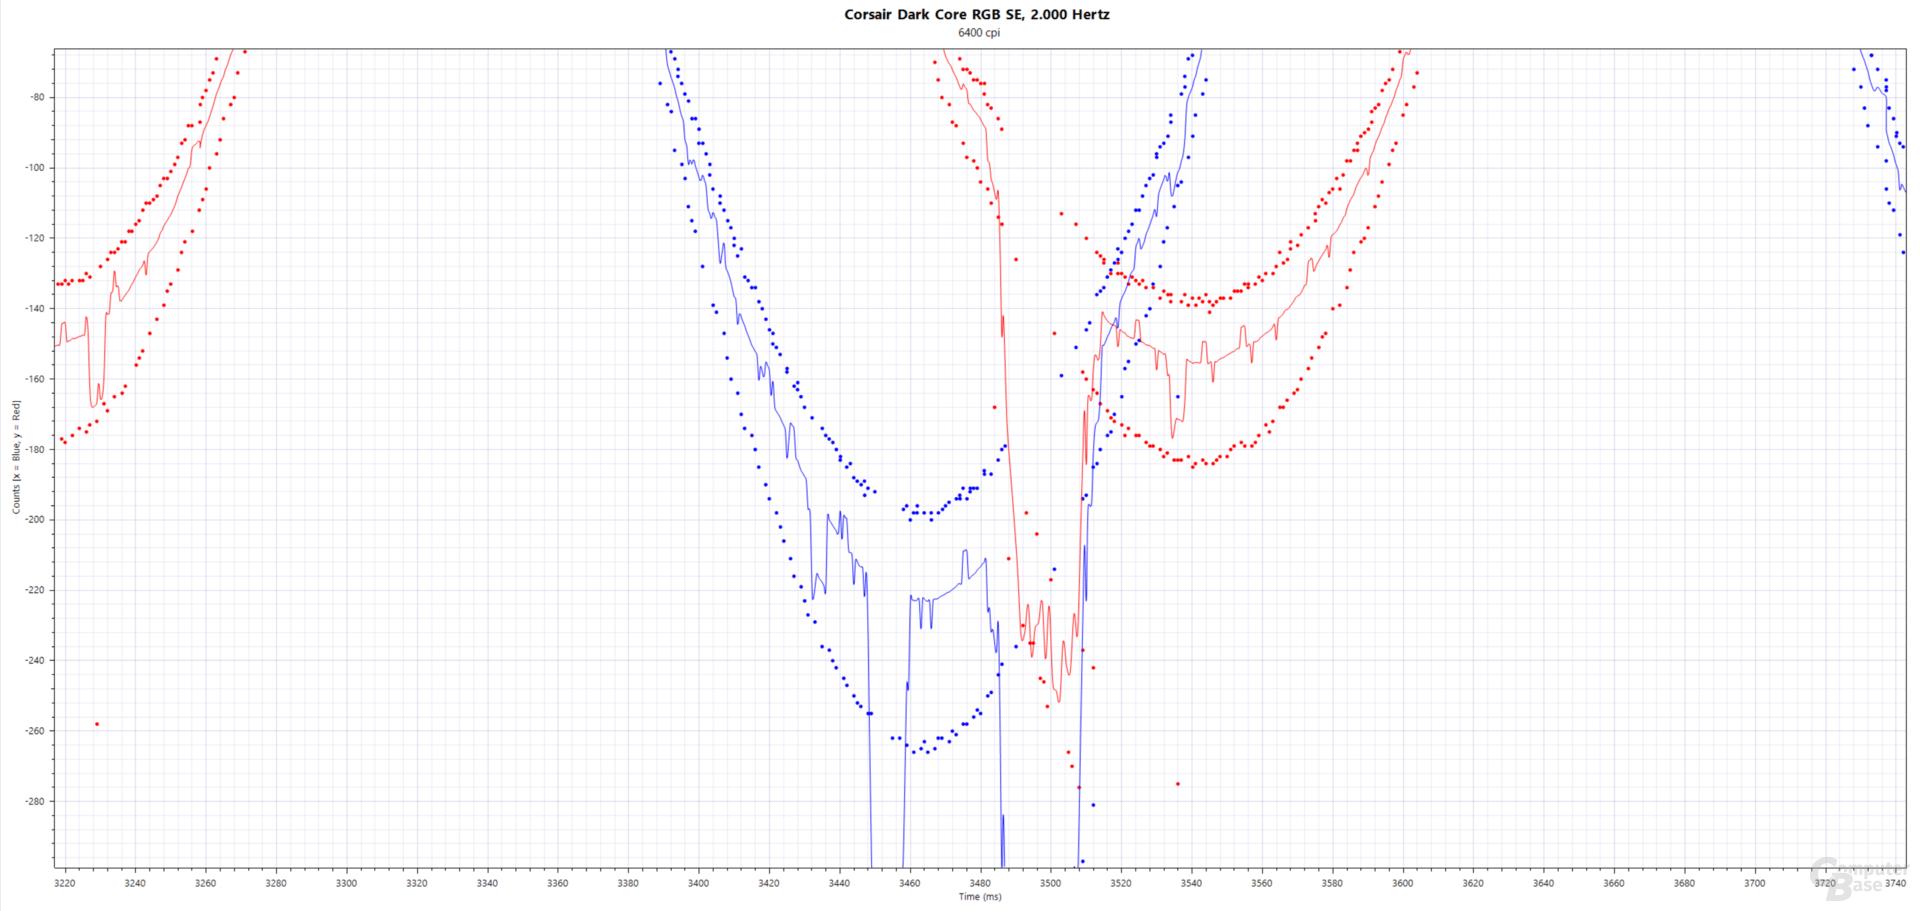 Blau: xCounts(ms), Rot: yCounts(ms); Corsair Dark Core RGB SE (PAW-3392, 6.400 cpi, 2.000 Hertz, Stoffmauspad)